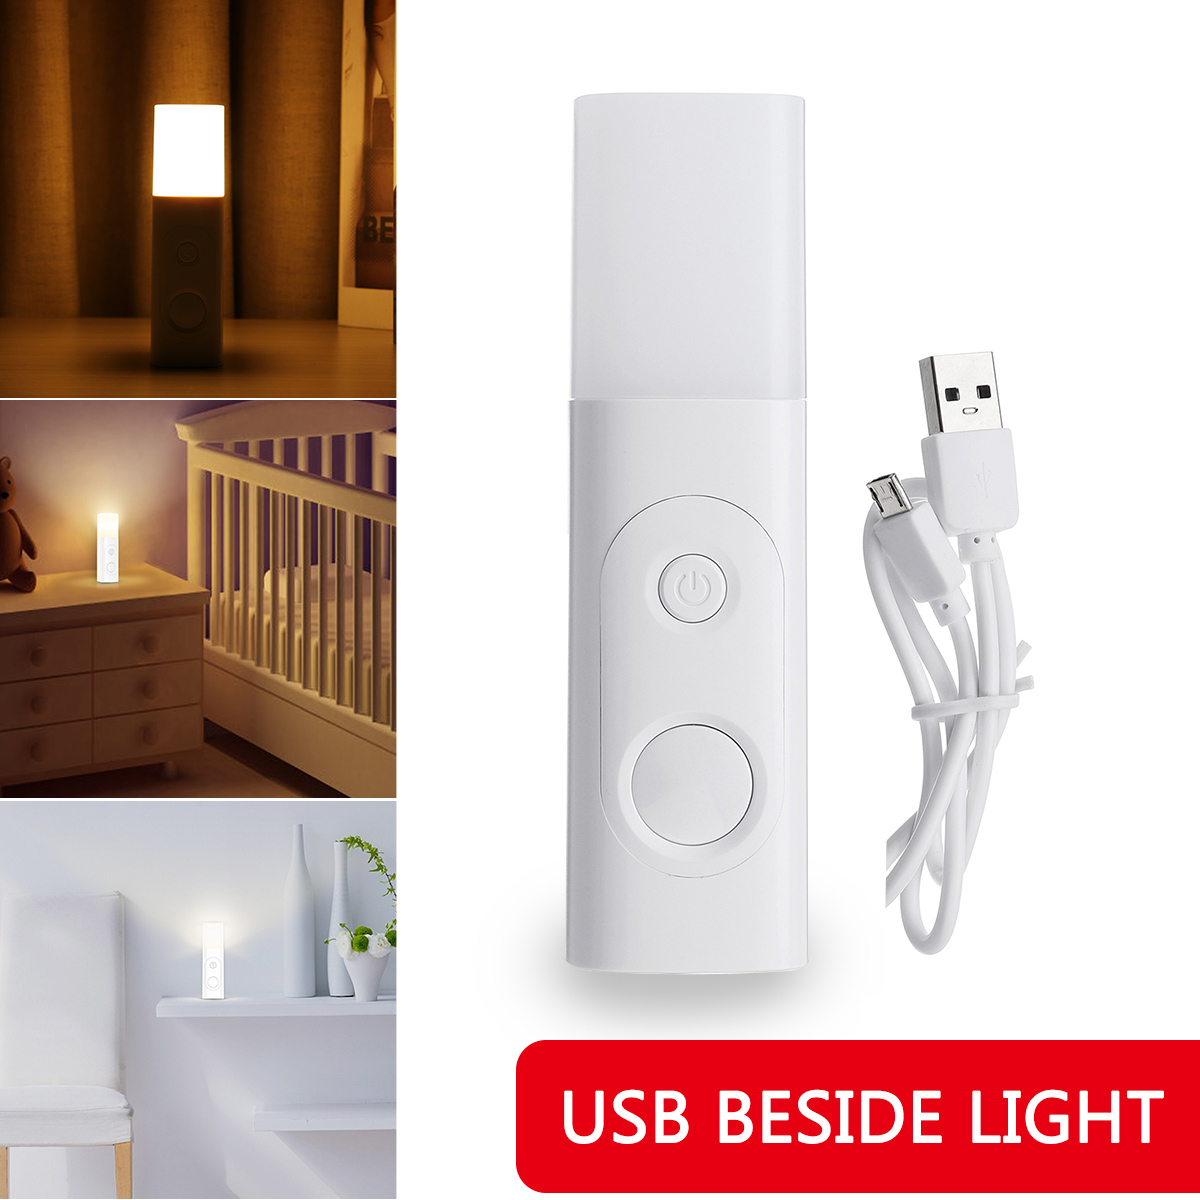 NEW Clip-on Table Desk Lamp Table Desk Lamp DC5V 1200mA Eye Protection Induction Night Light LED Flexible USB Reading Light